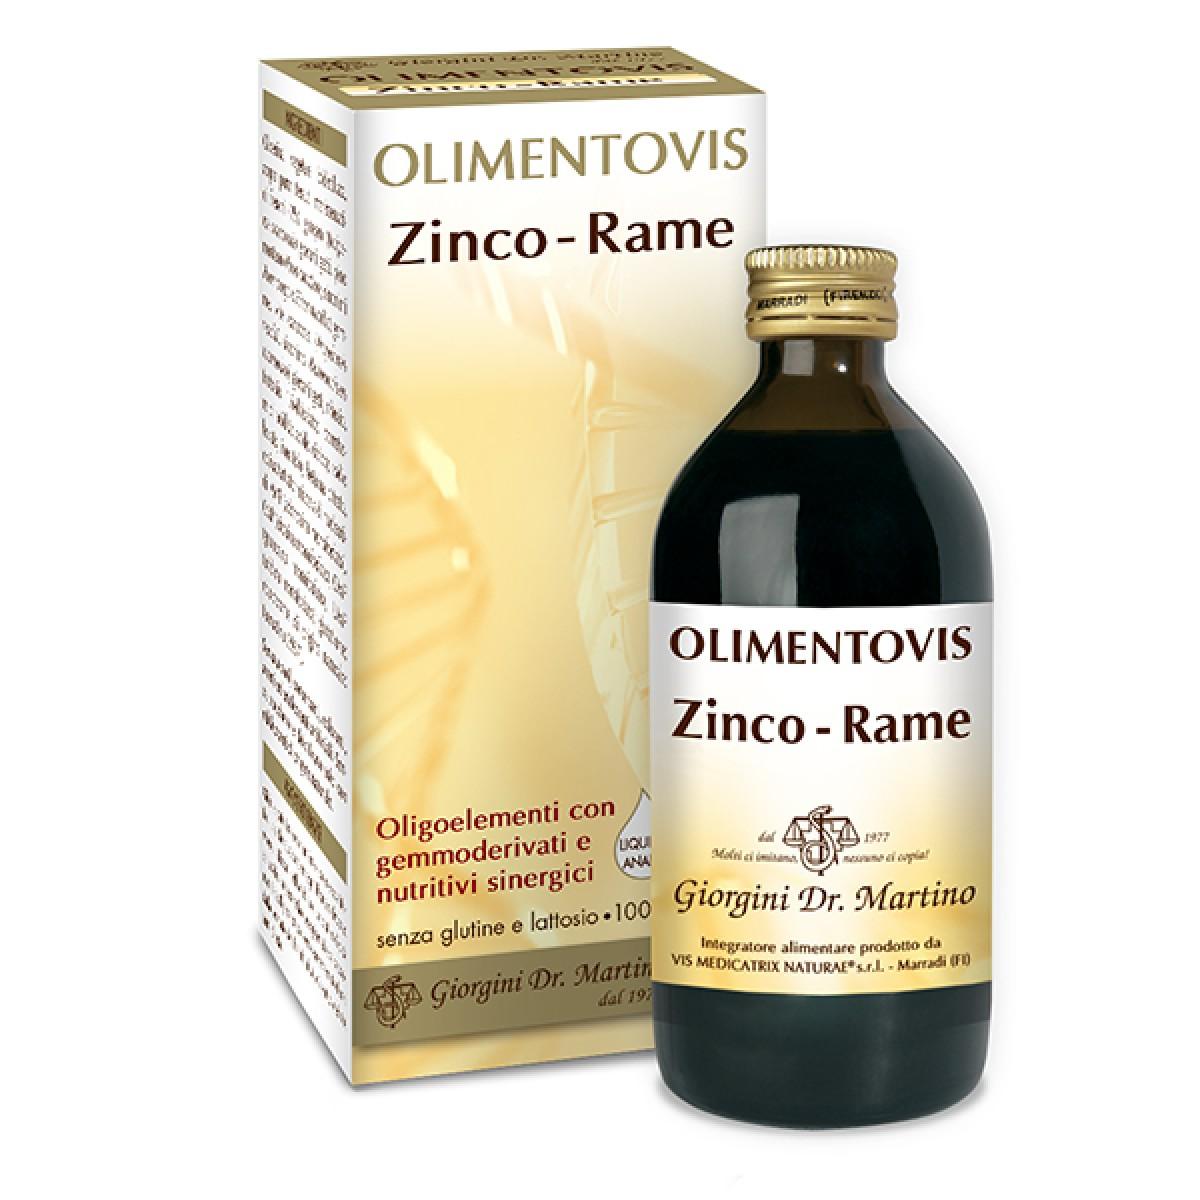 Zinco Rame Olimentovis 200nl Oligoelemento Zn-Cu